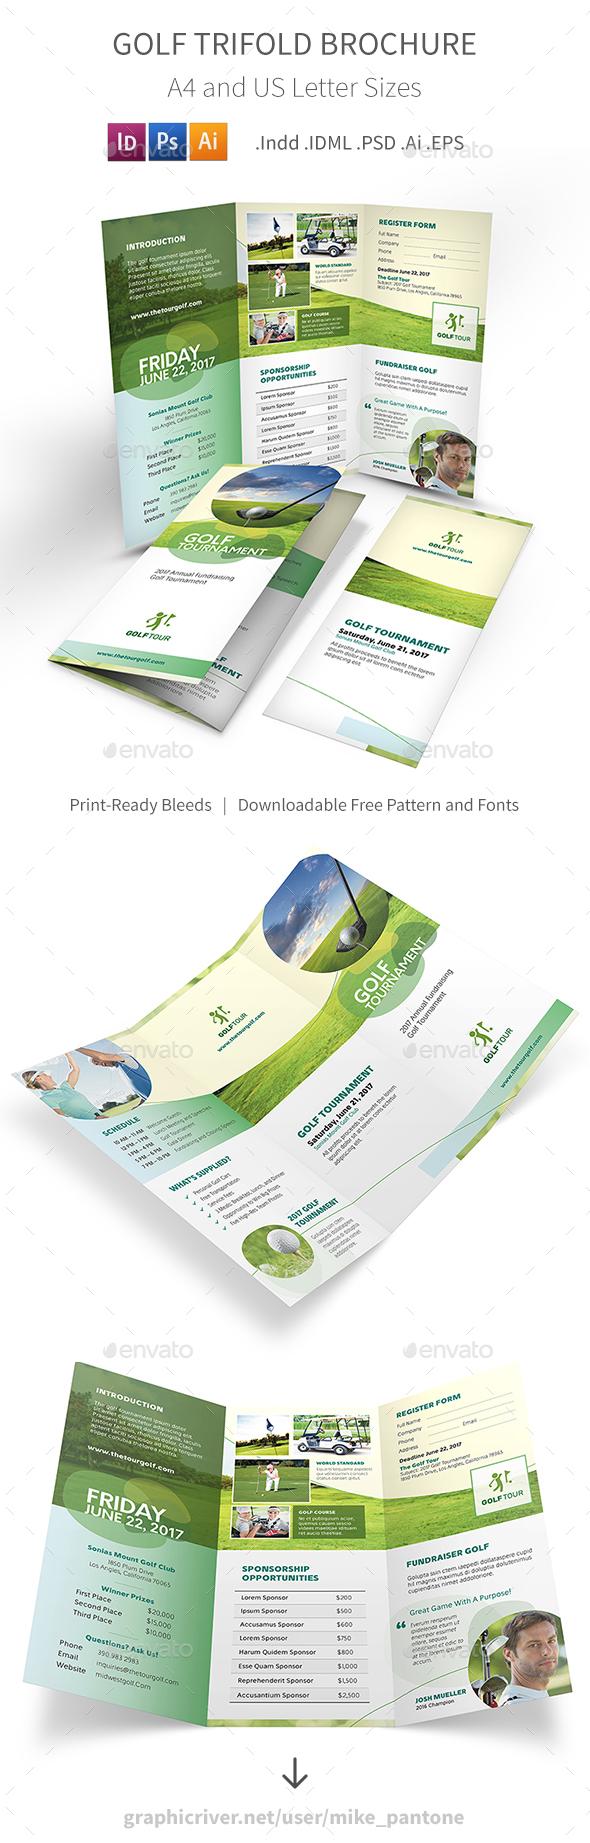 Golf Trifold Brochure 6 - Informational Brochures